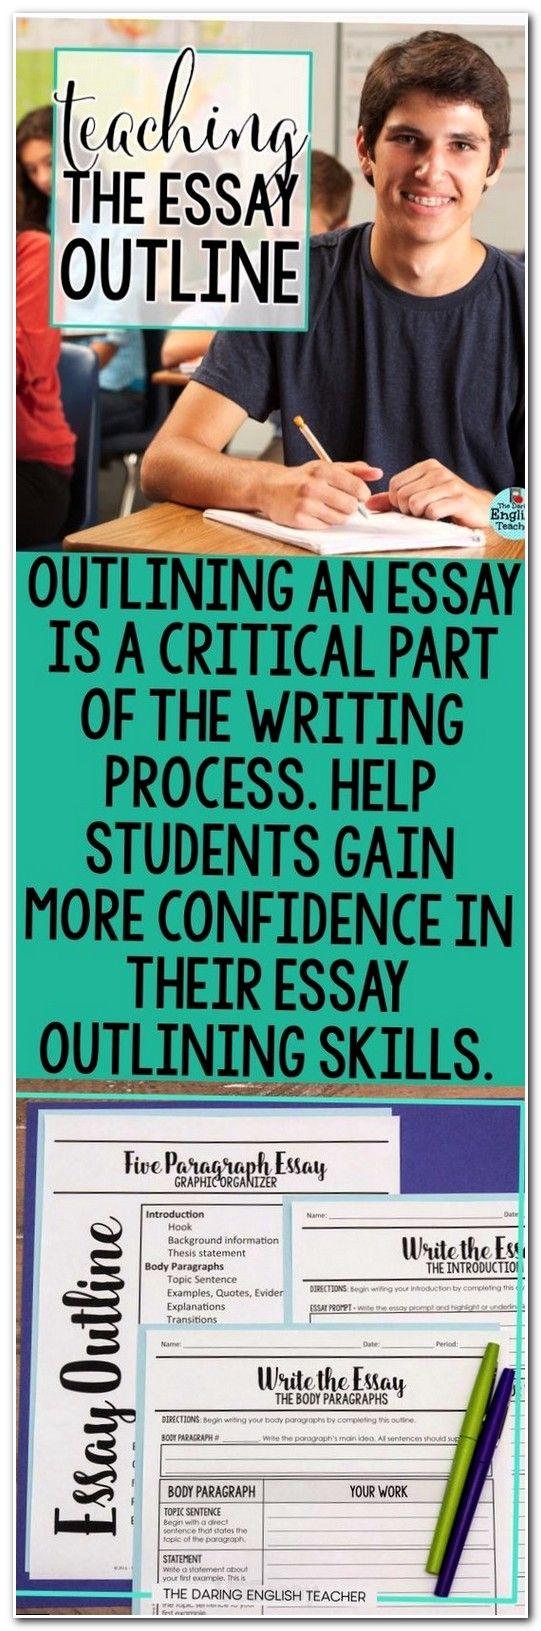 macbeth essays examples